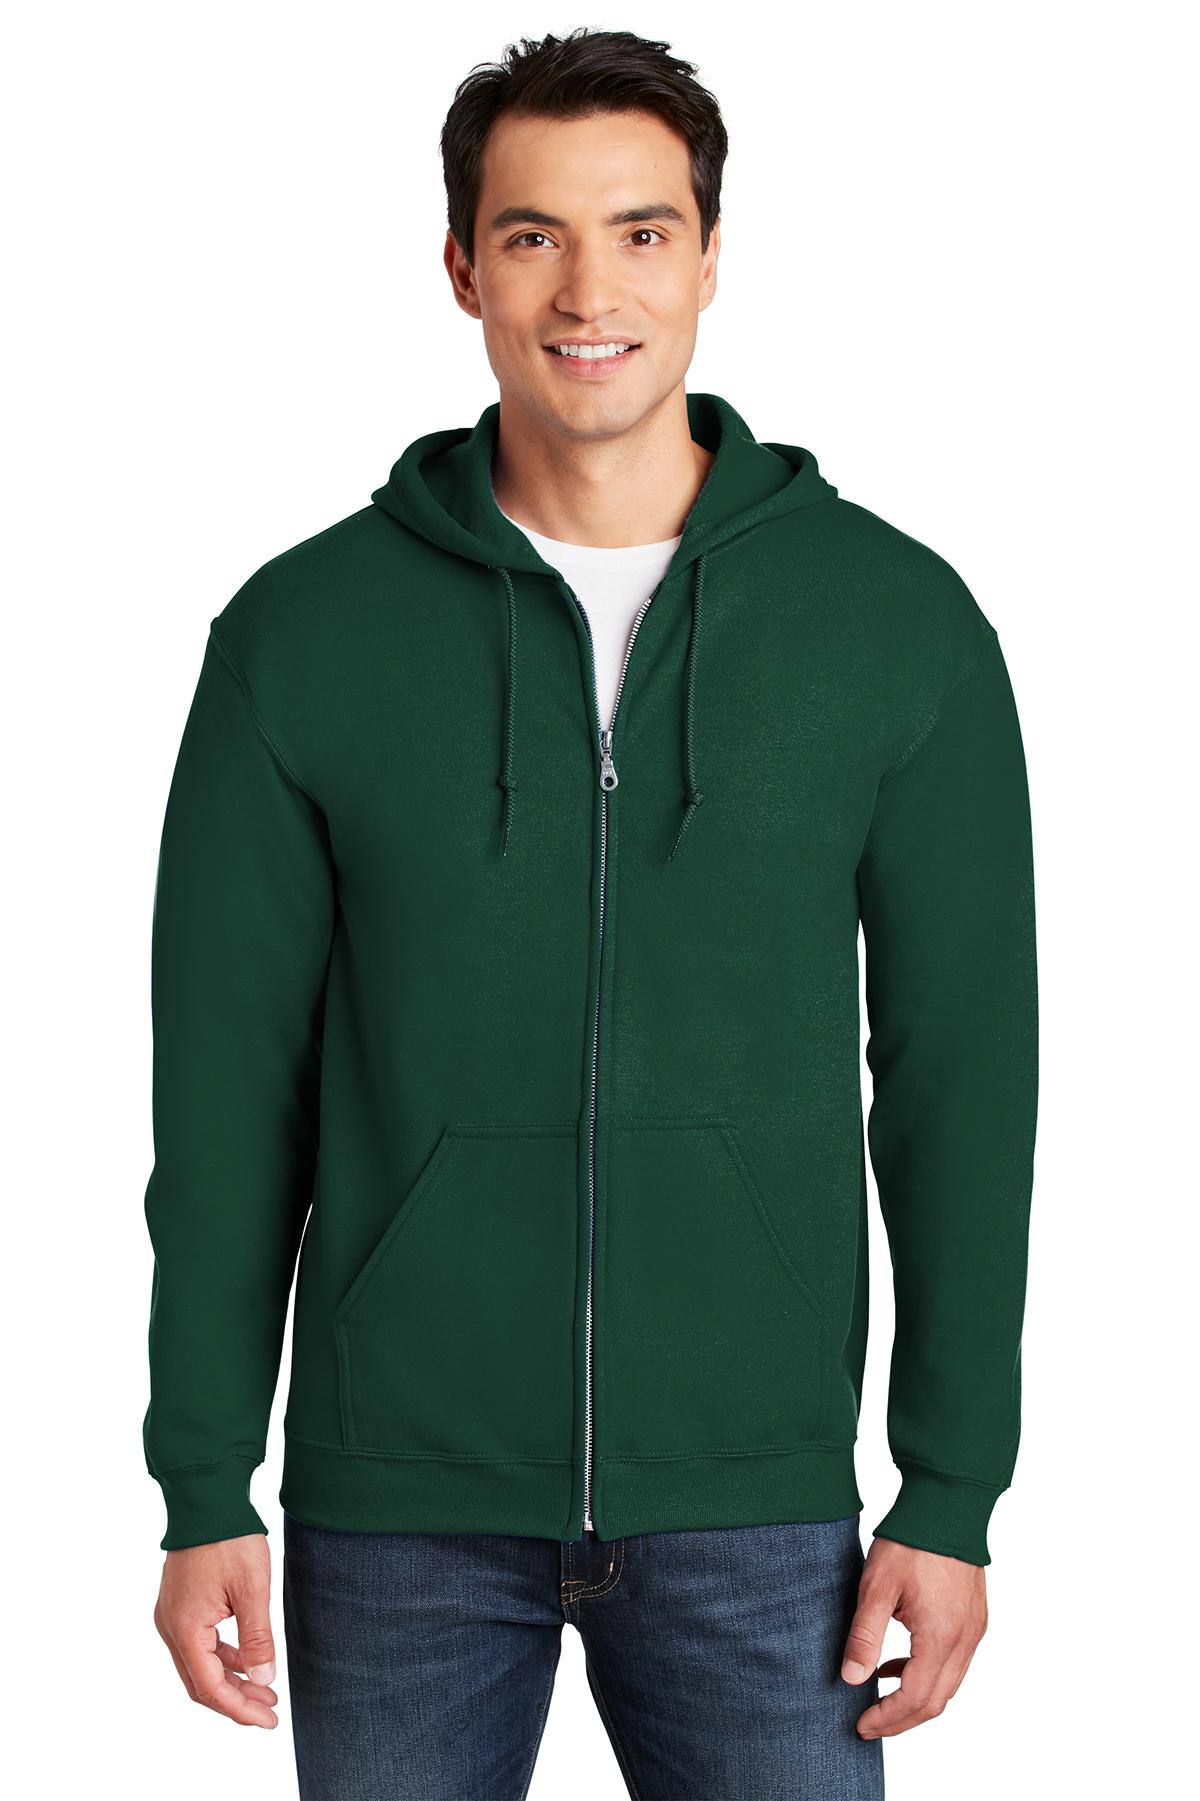 Gildan Heavy Blend Full-Zip Hooded Hoodie Sweatshirt Sizes S-5XL 18600